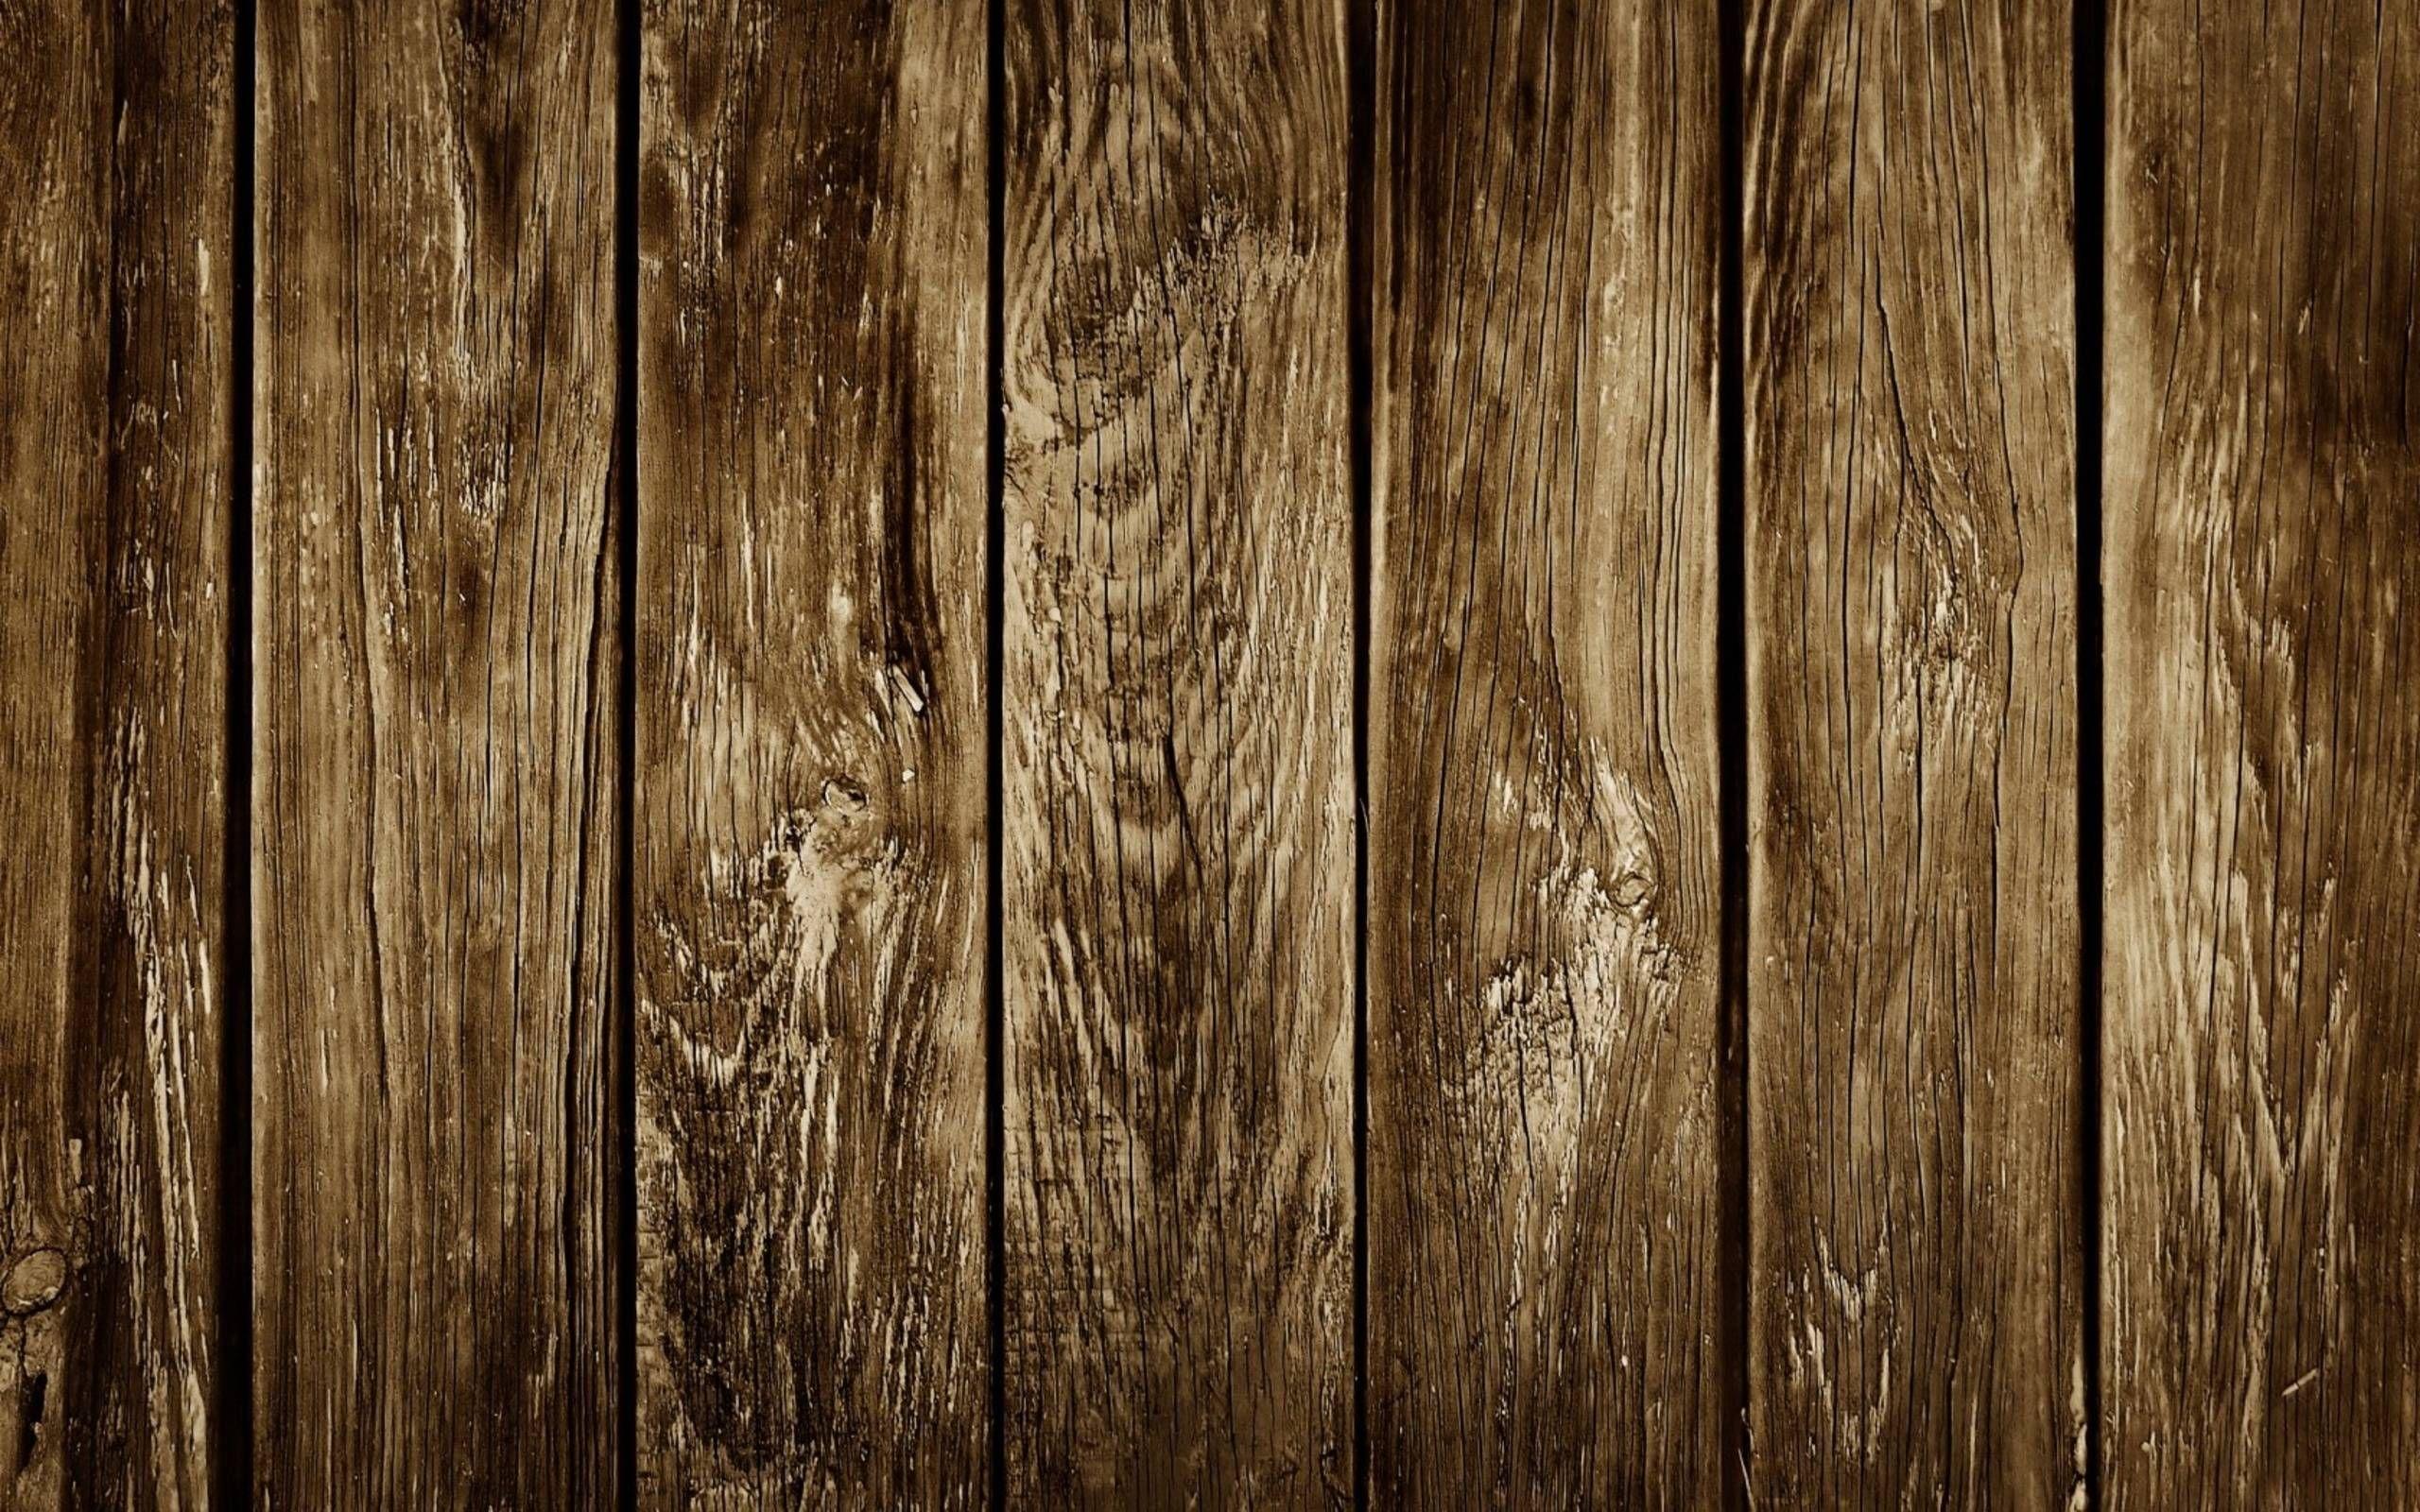 Moldy Wooden Board Wedding Baby Photography Background Custom Photography Studio Photography Background